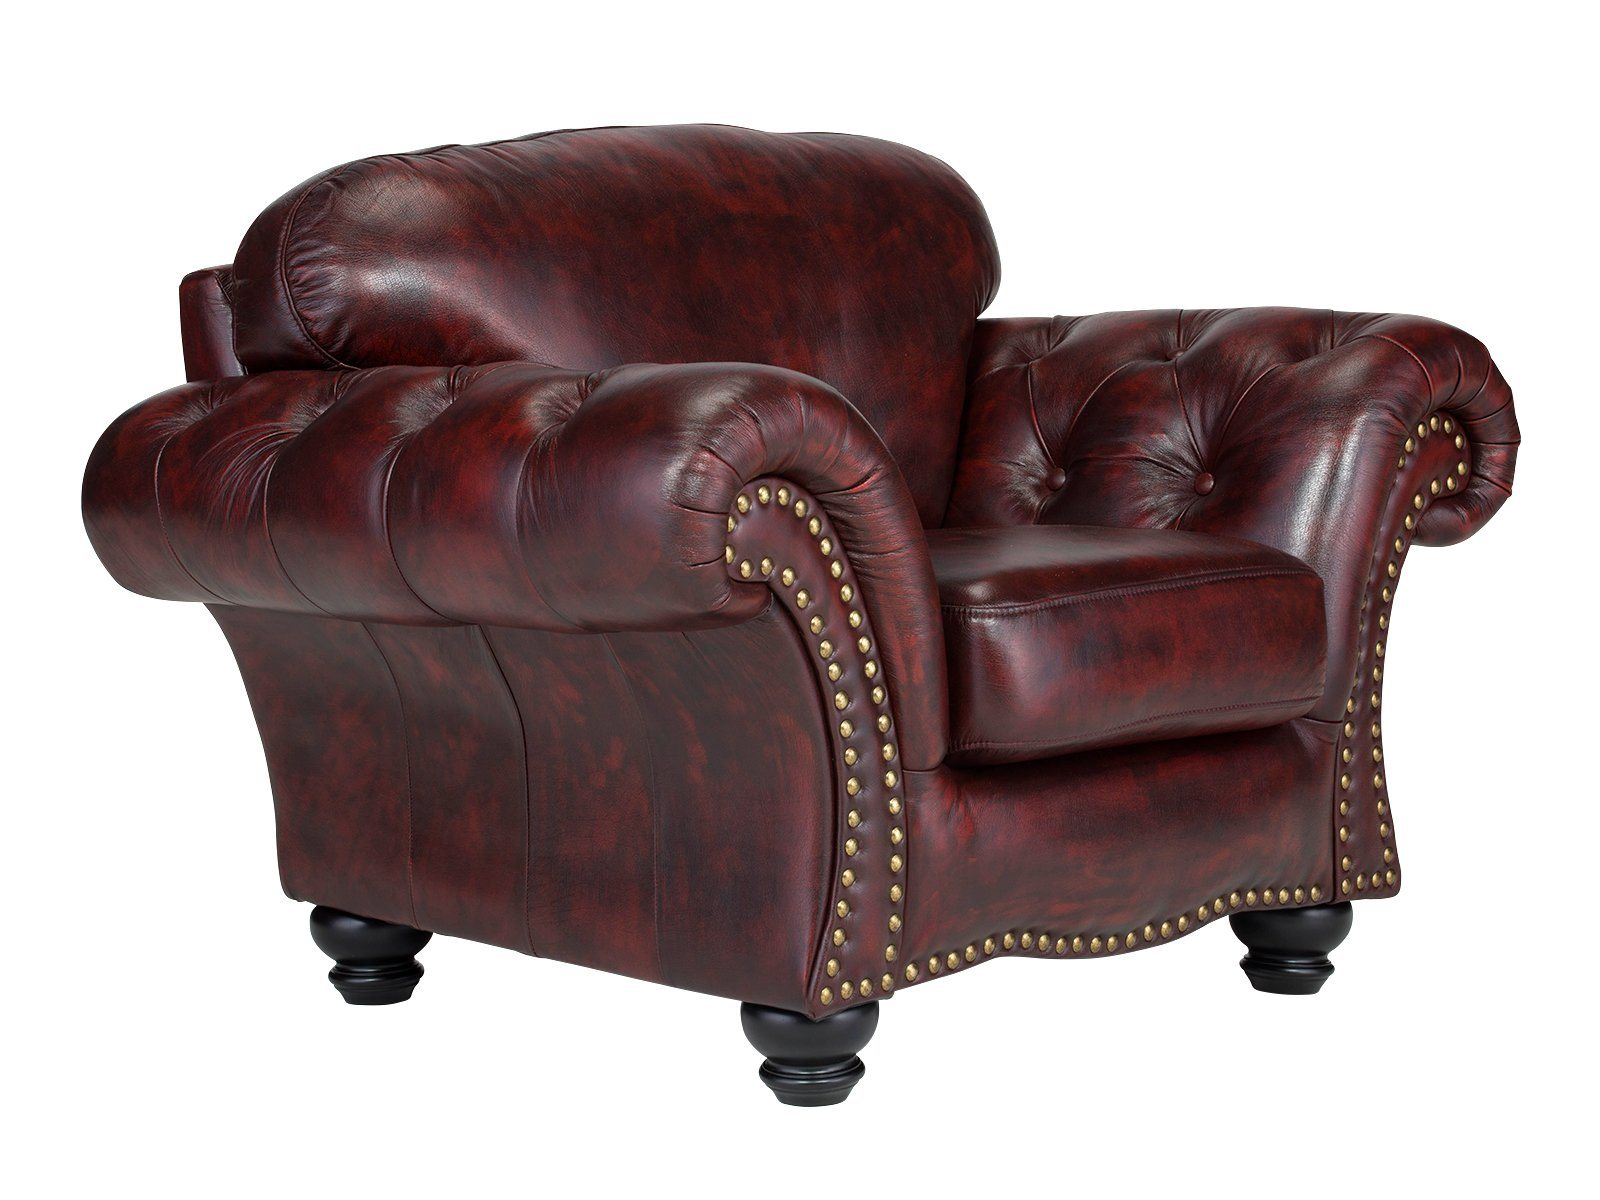 massivum sessel aus echtleder bolton rot online kaufen bei woonio. Black Bedroom Furniture Sets. Home Design Ideas